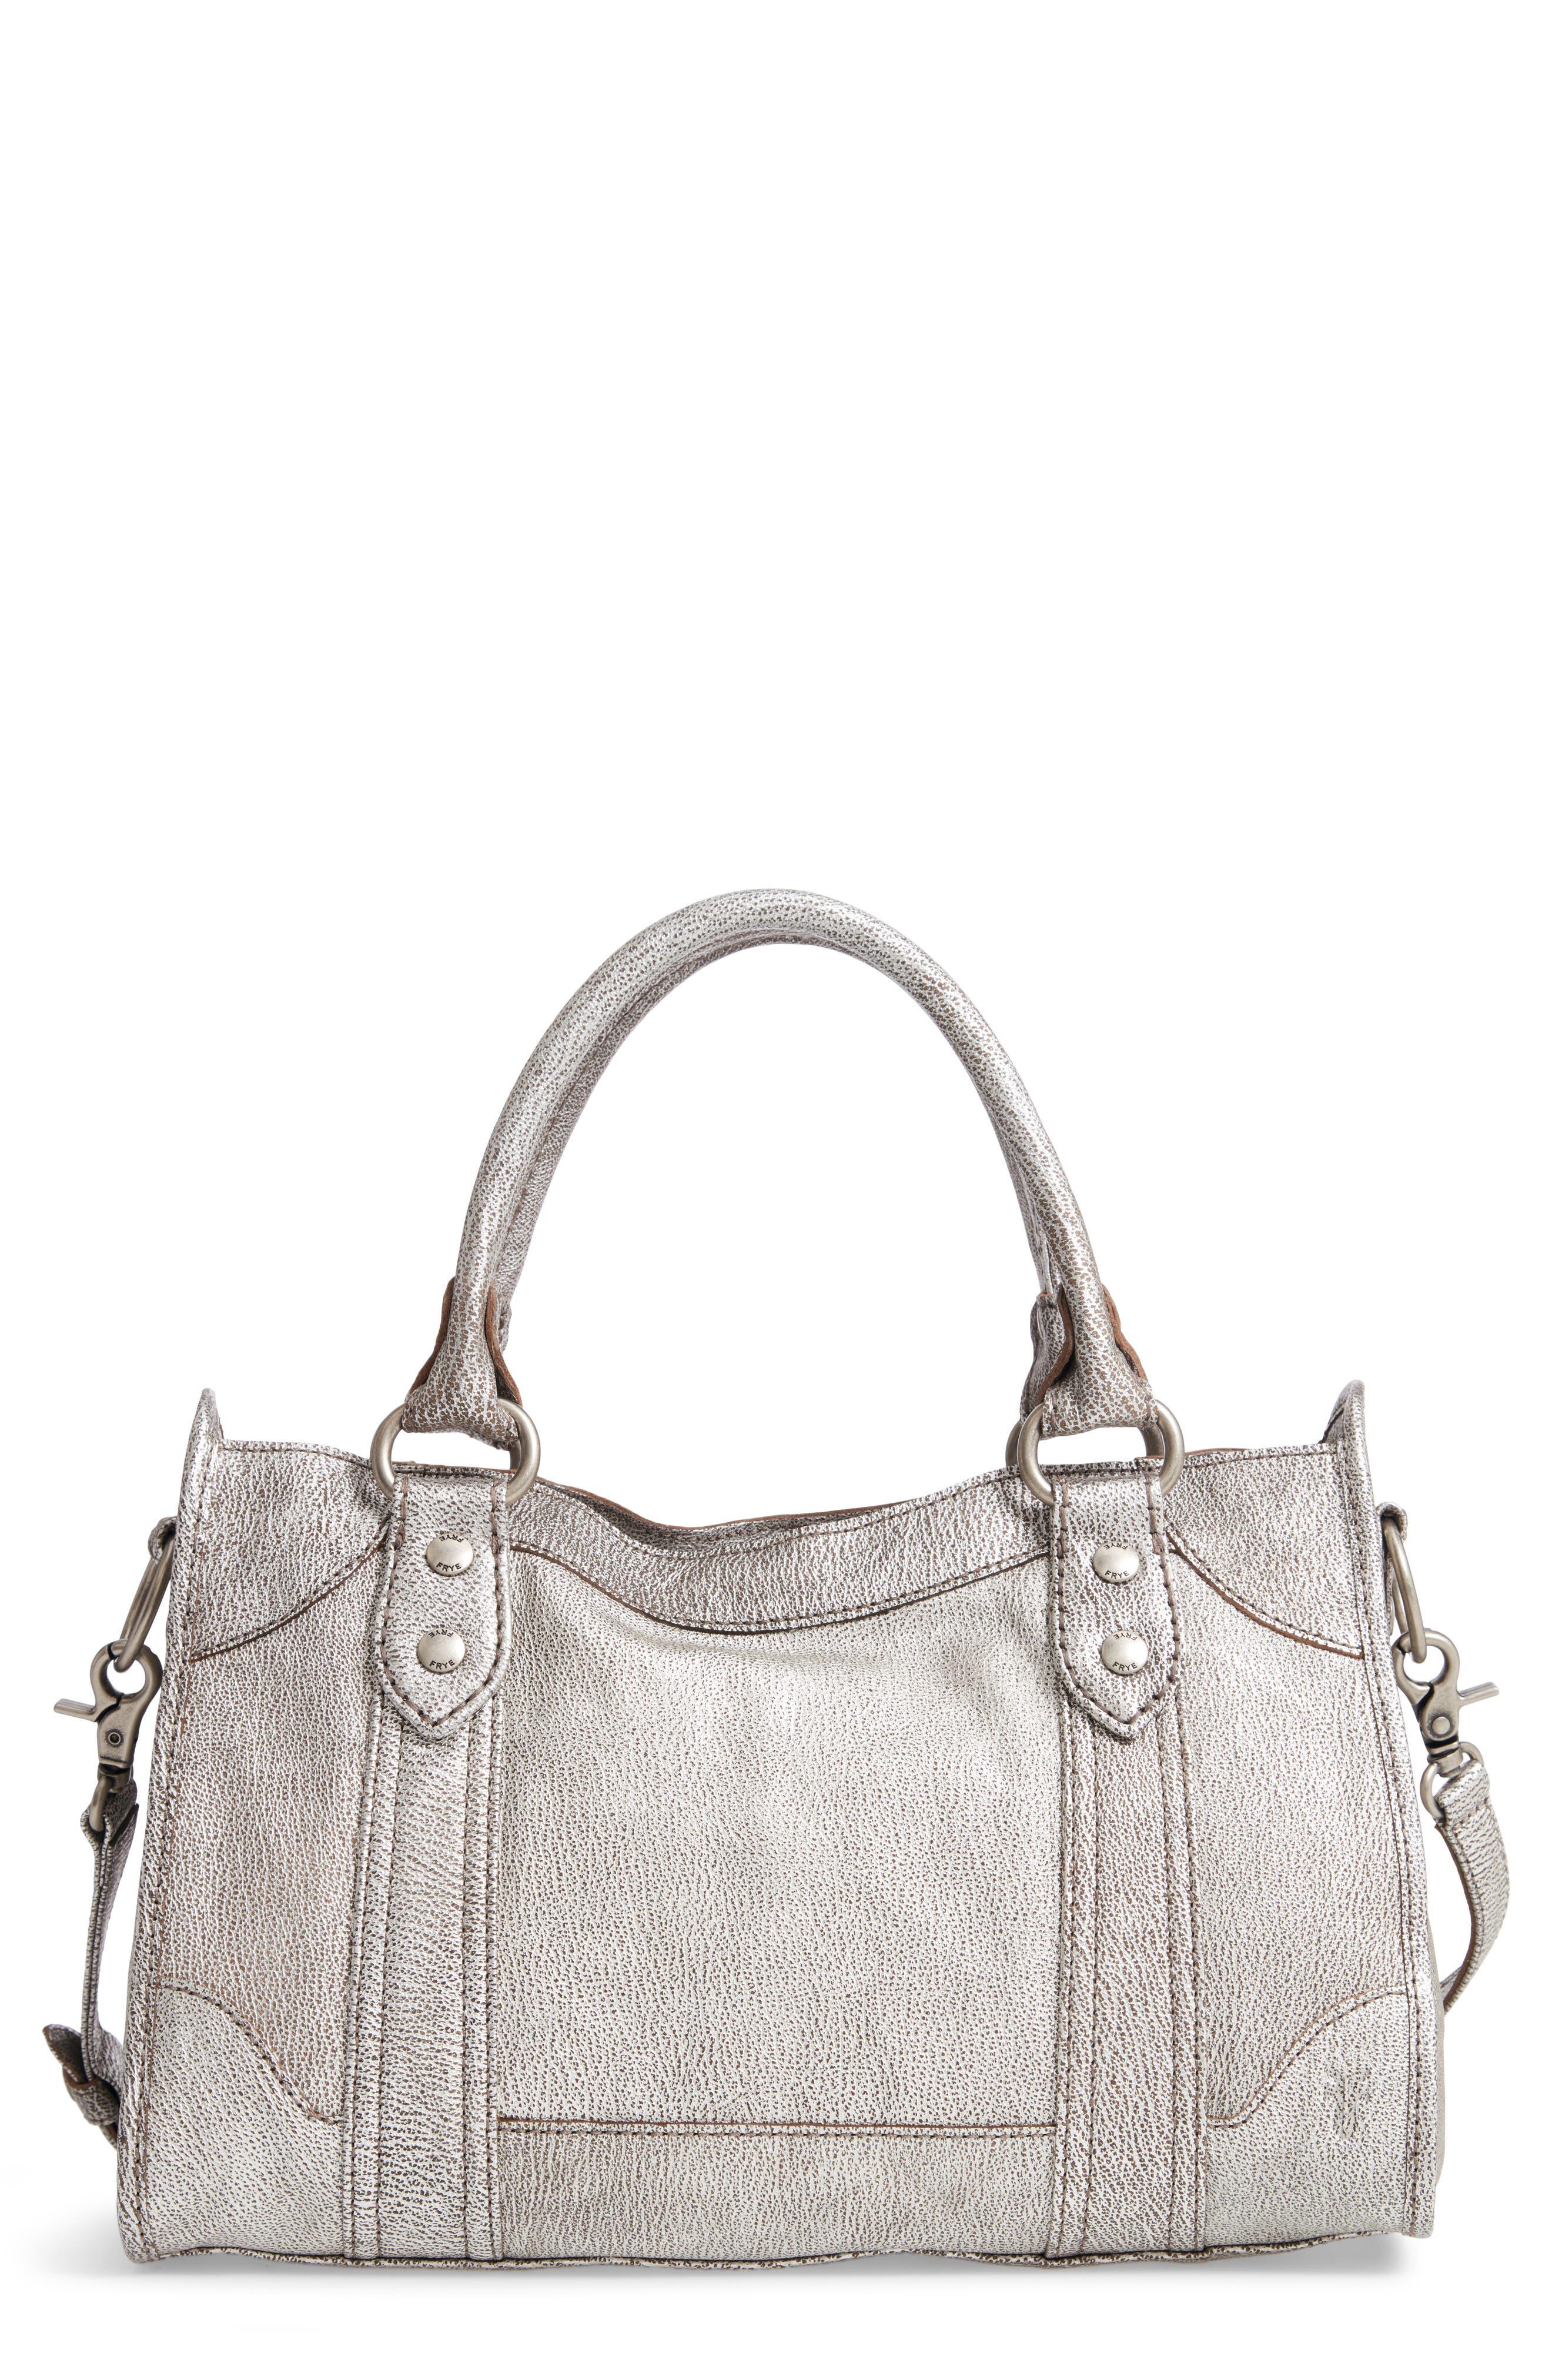 FRYE,                             Melissa Metallic Leather Satchel,                             Main thumbnail 1, color,                             040